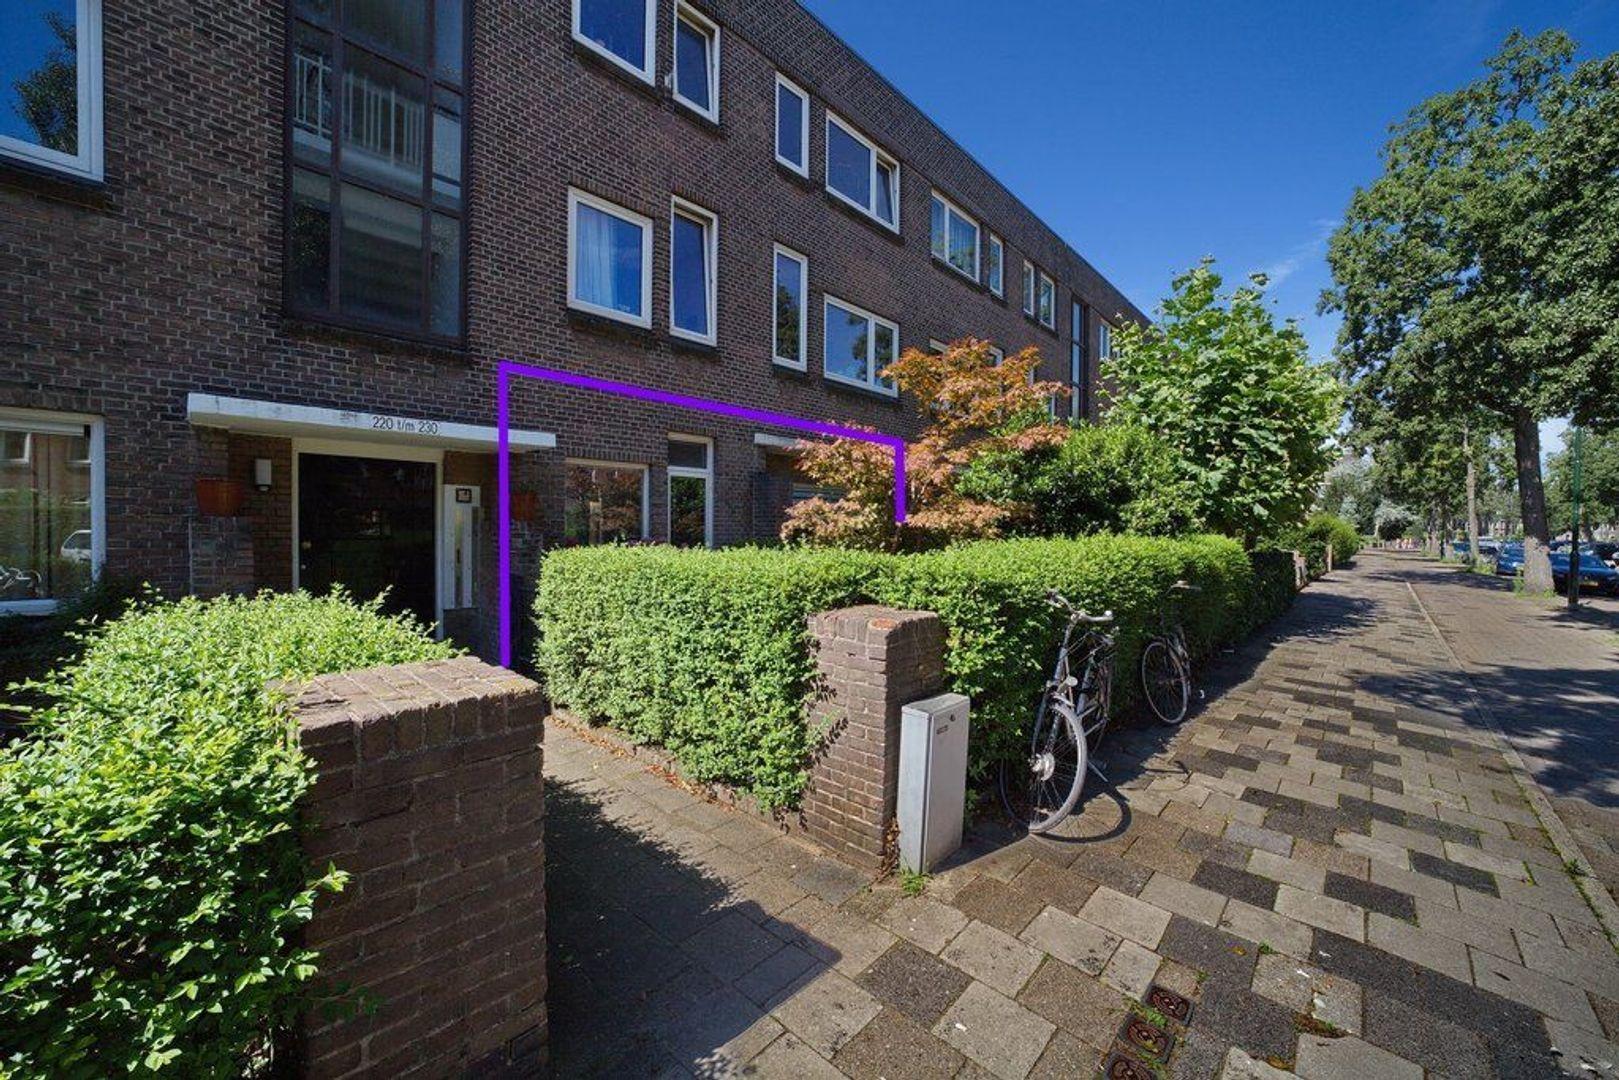 Koningin Wilhelminalaan 230, Voorburg foto-24 blur